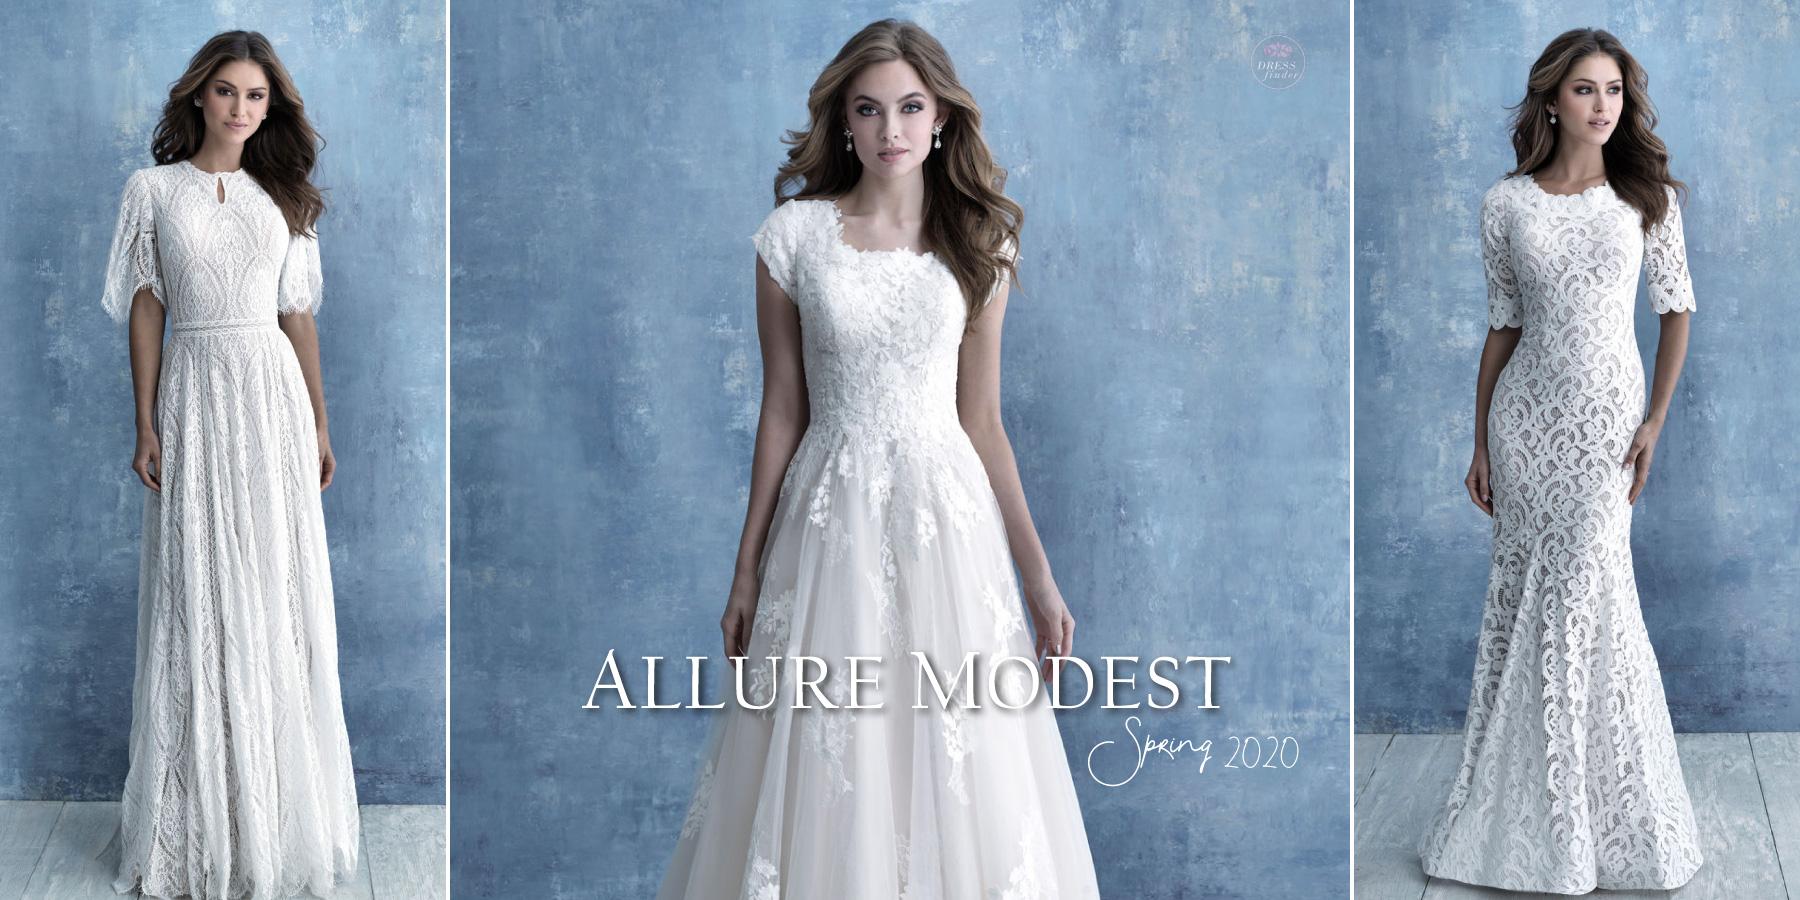 Allure Modest